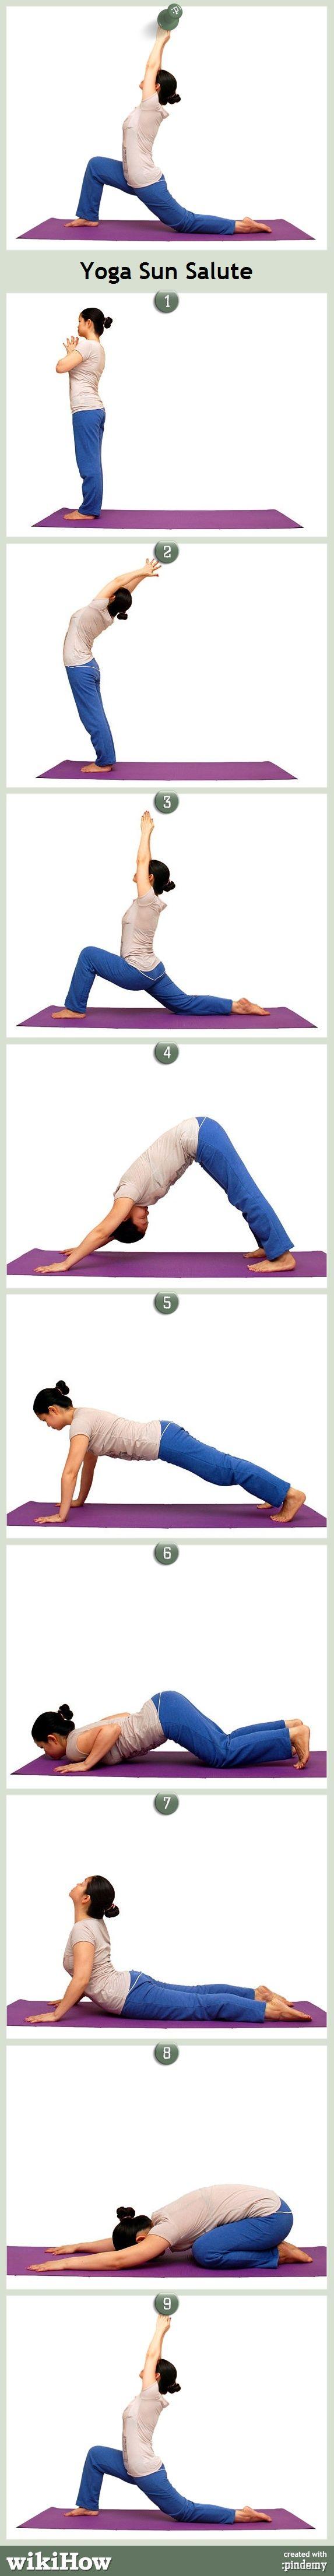 Yoga Lesson! How to do the Sun Salute...